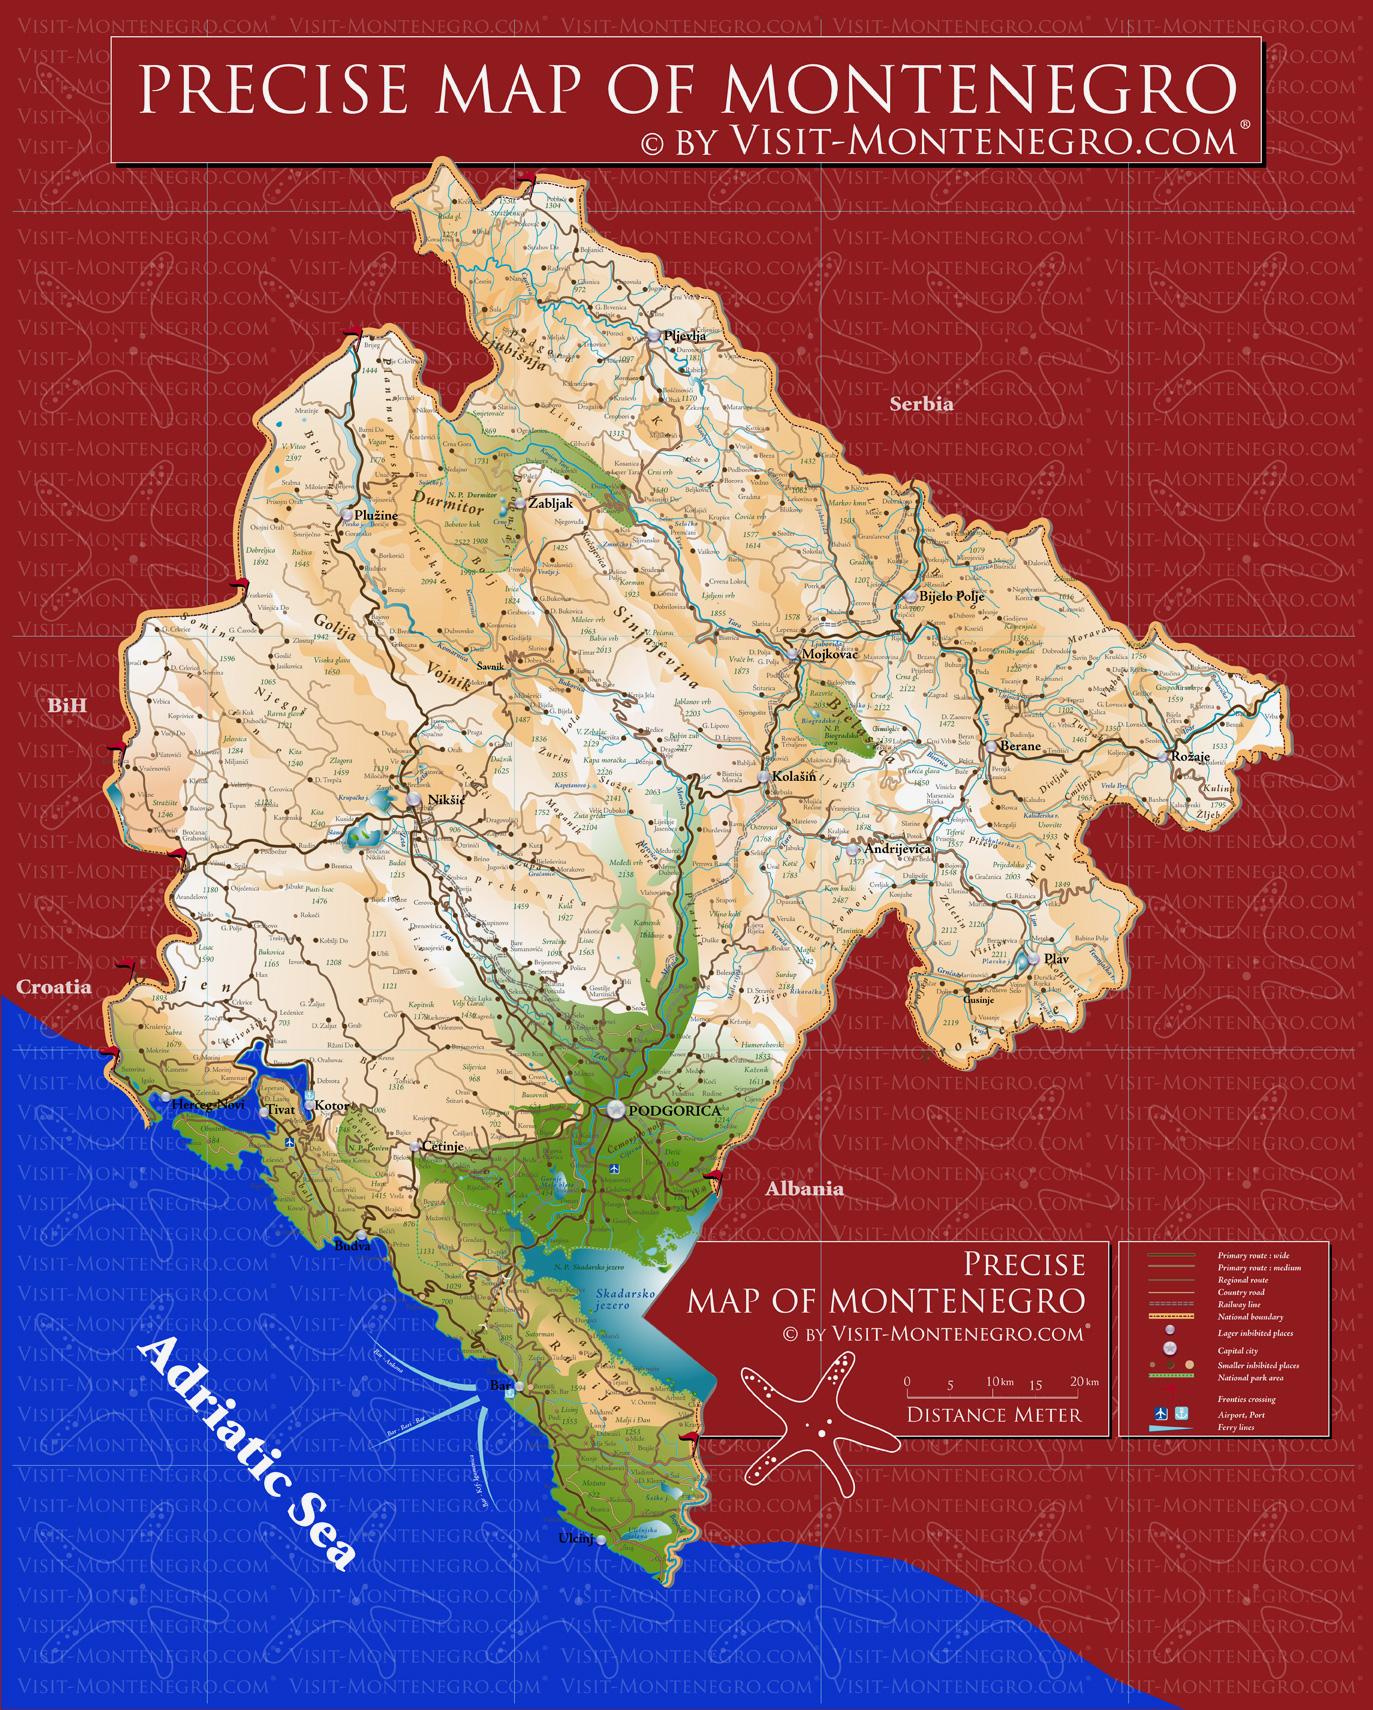 Montenegro Precise Map